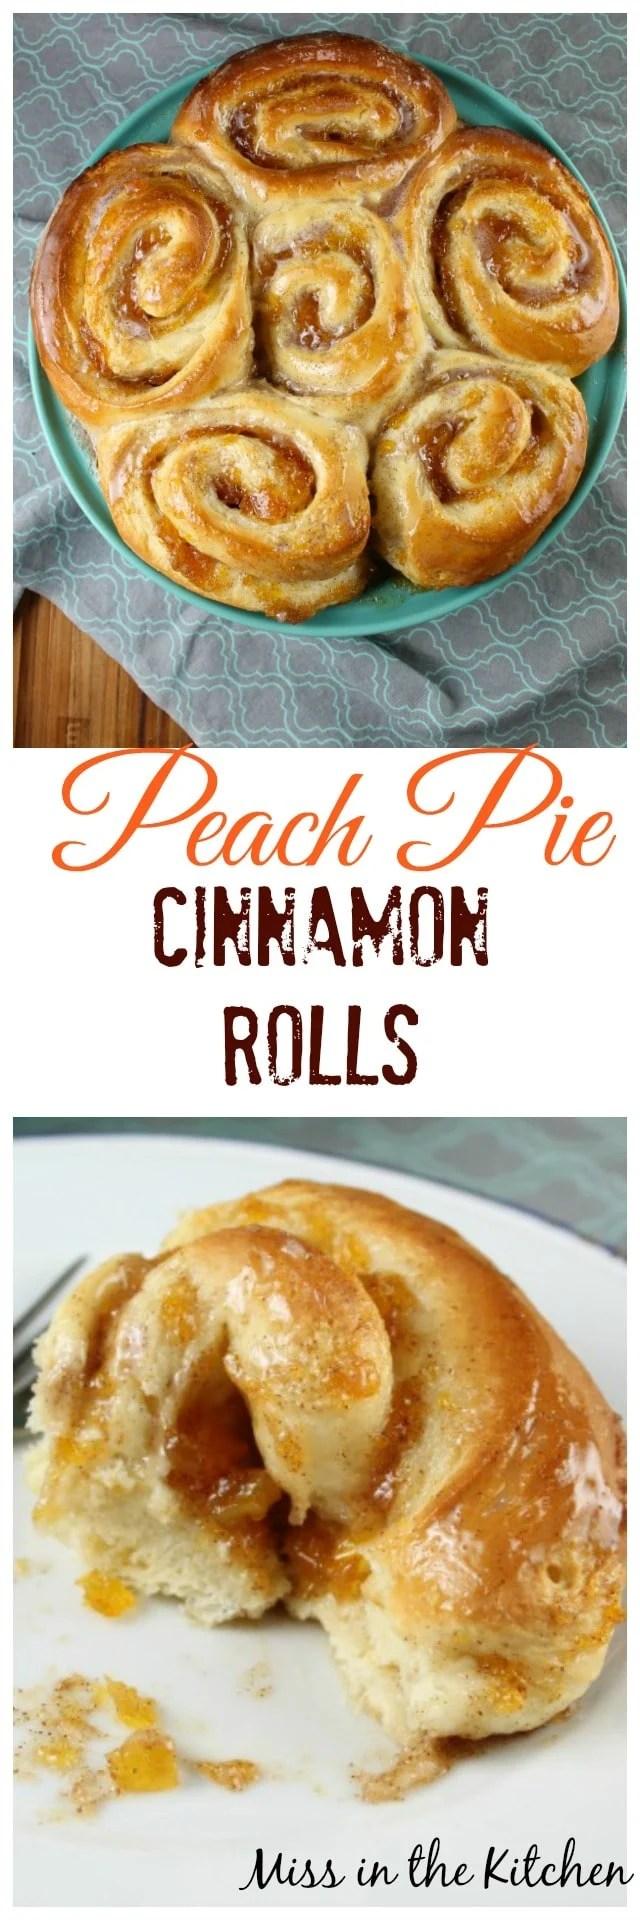 Peach Pie Cinnamon Rolls Recipe ~ Miss in the Kitchen #sponsored